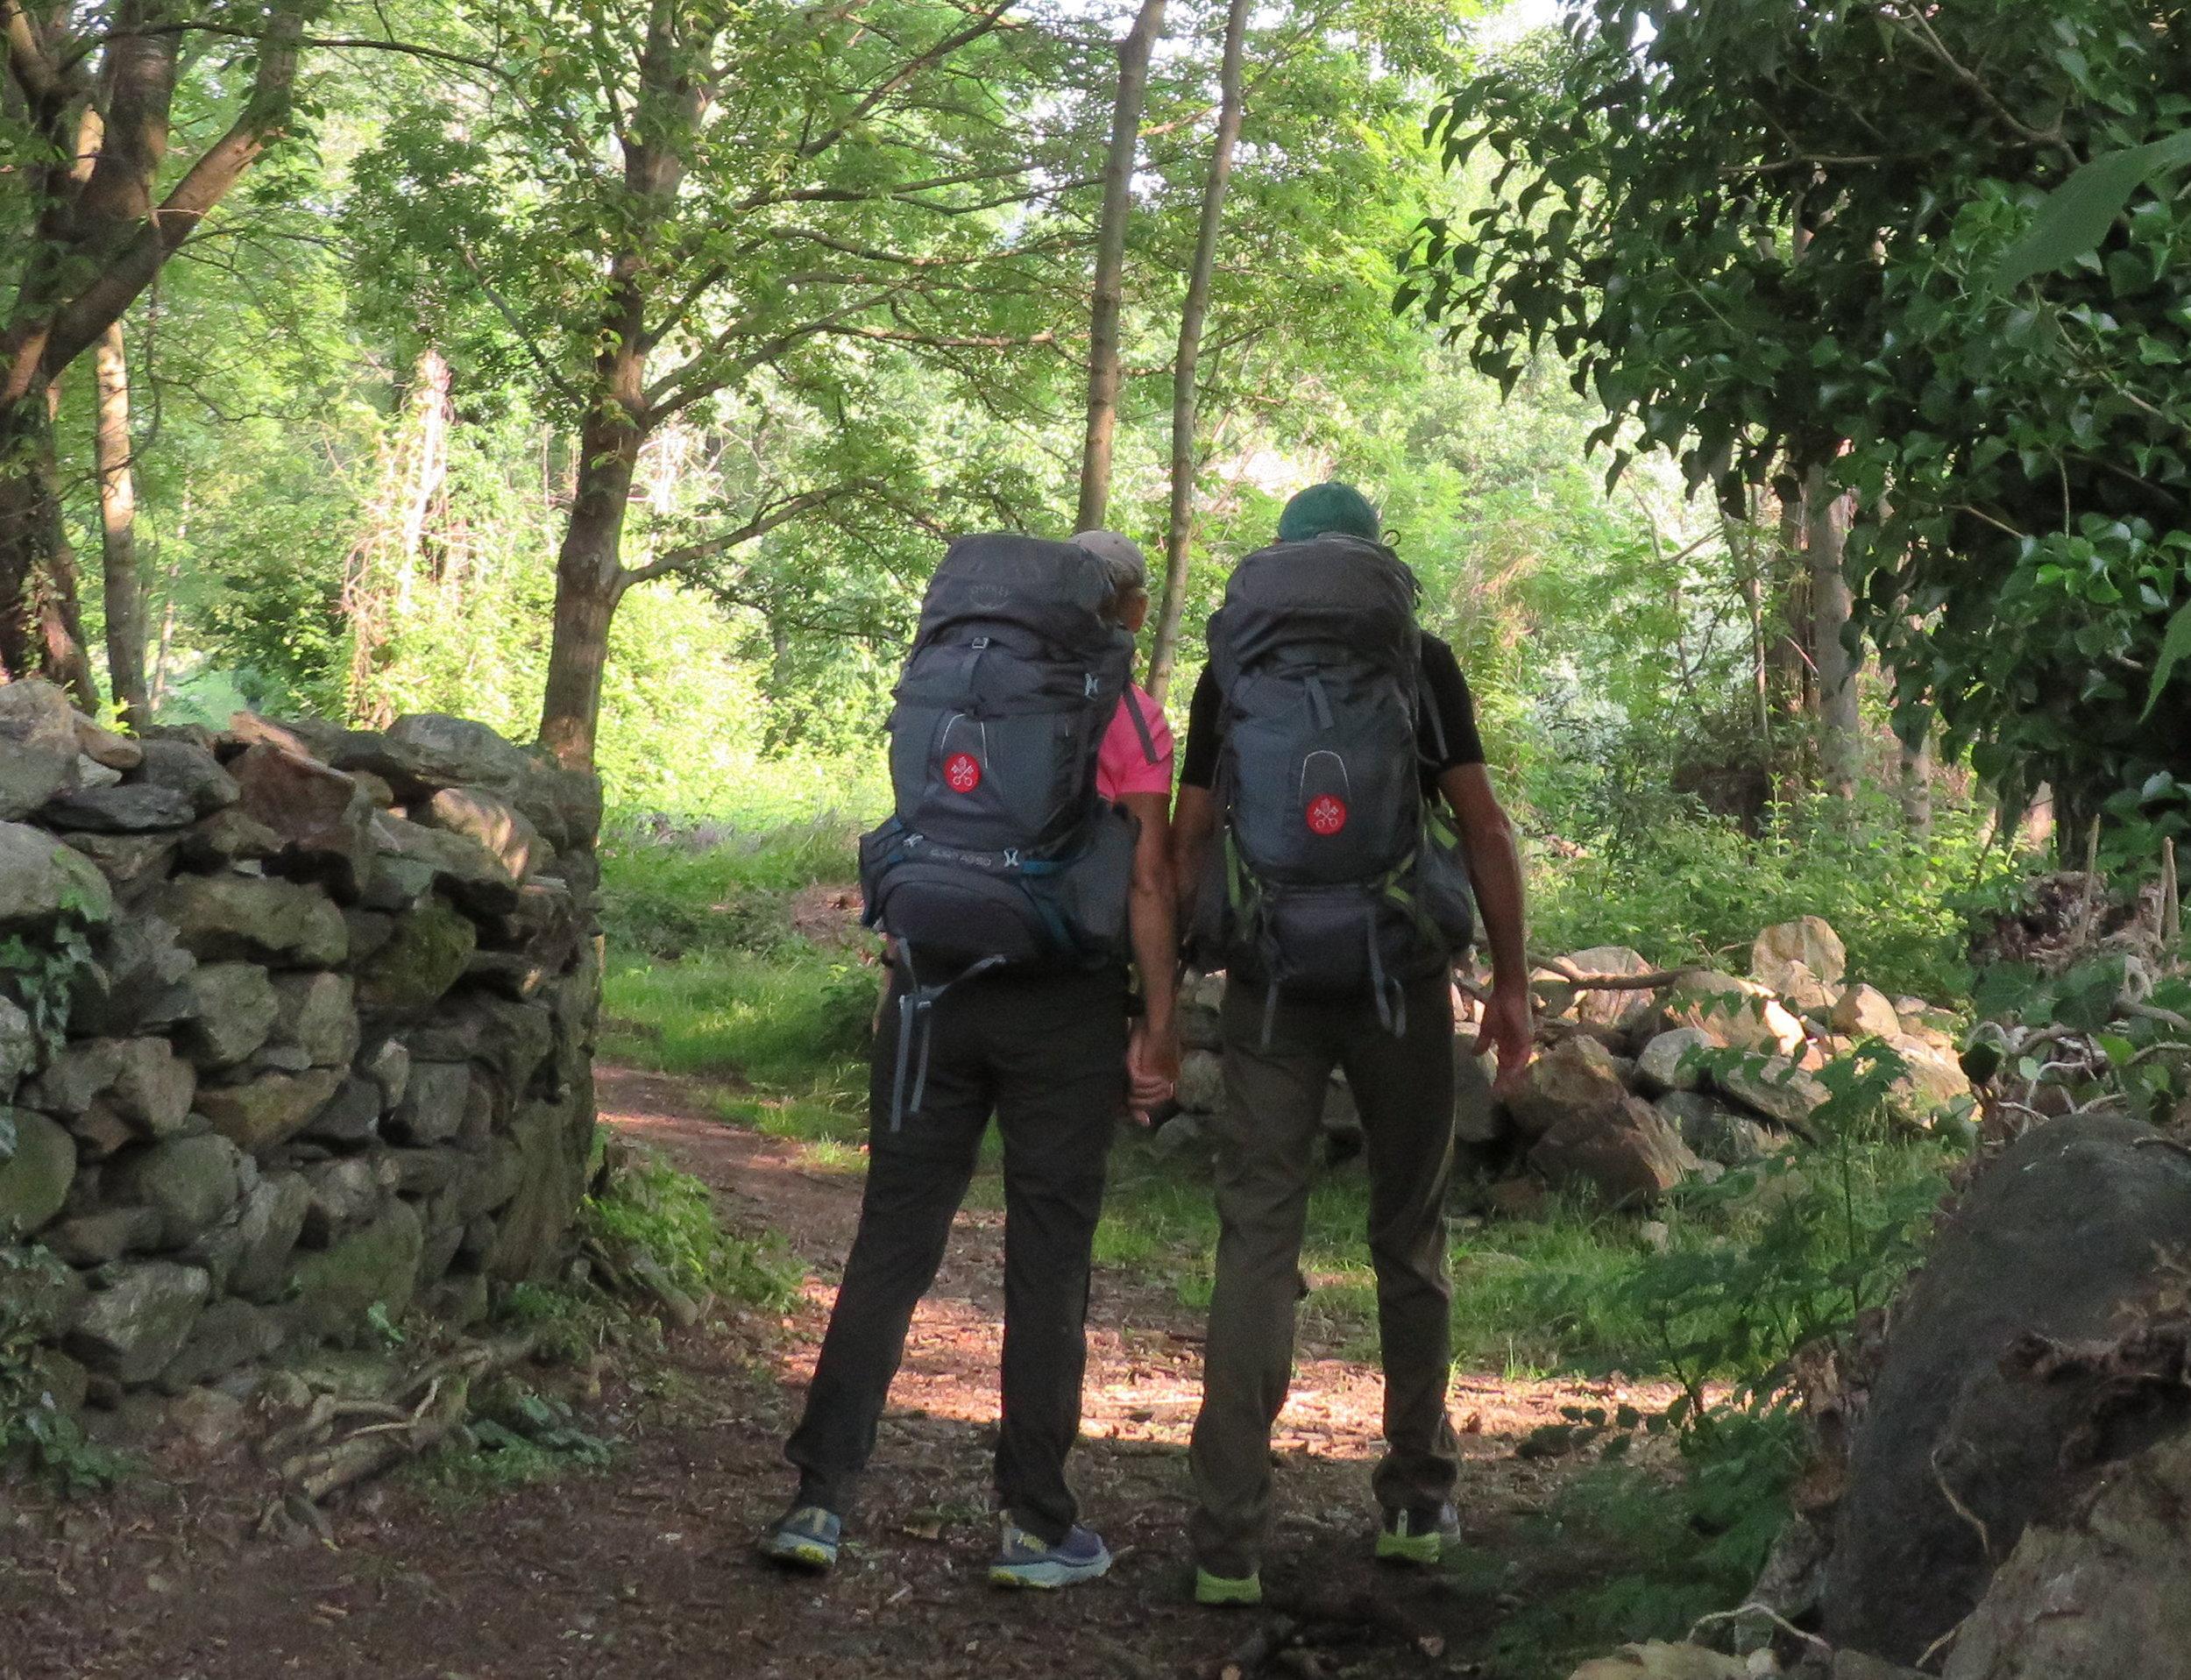 On the path to Ivrea